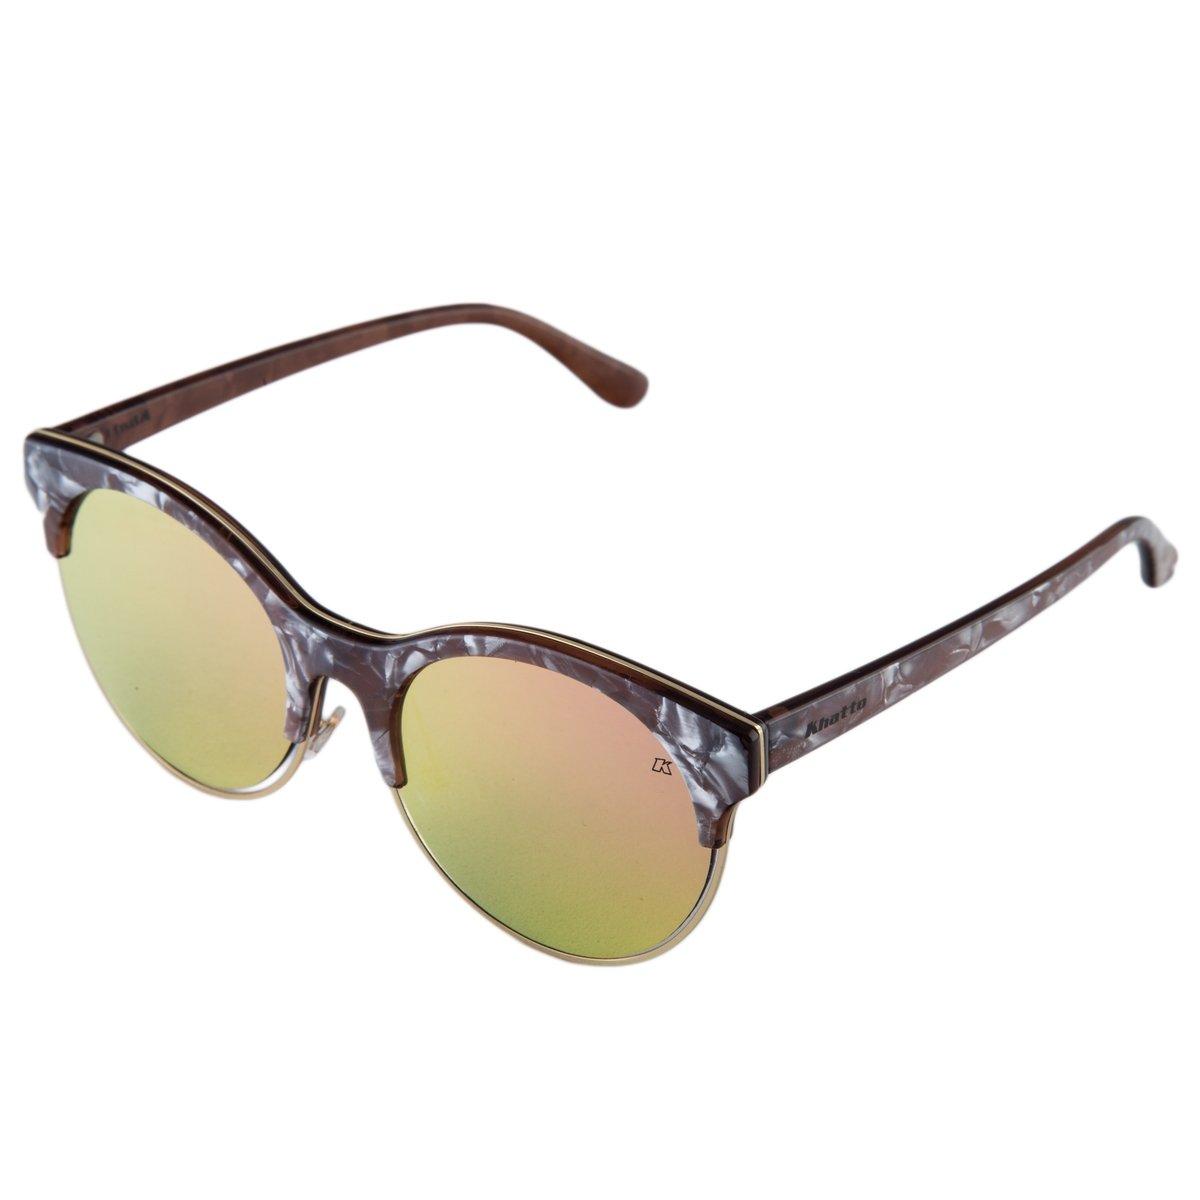 7ed7df79d1dd8 Óculos de Sol Khatto KT36159 - Compre Agora